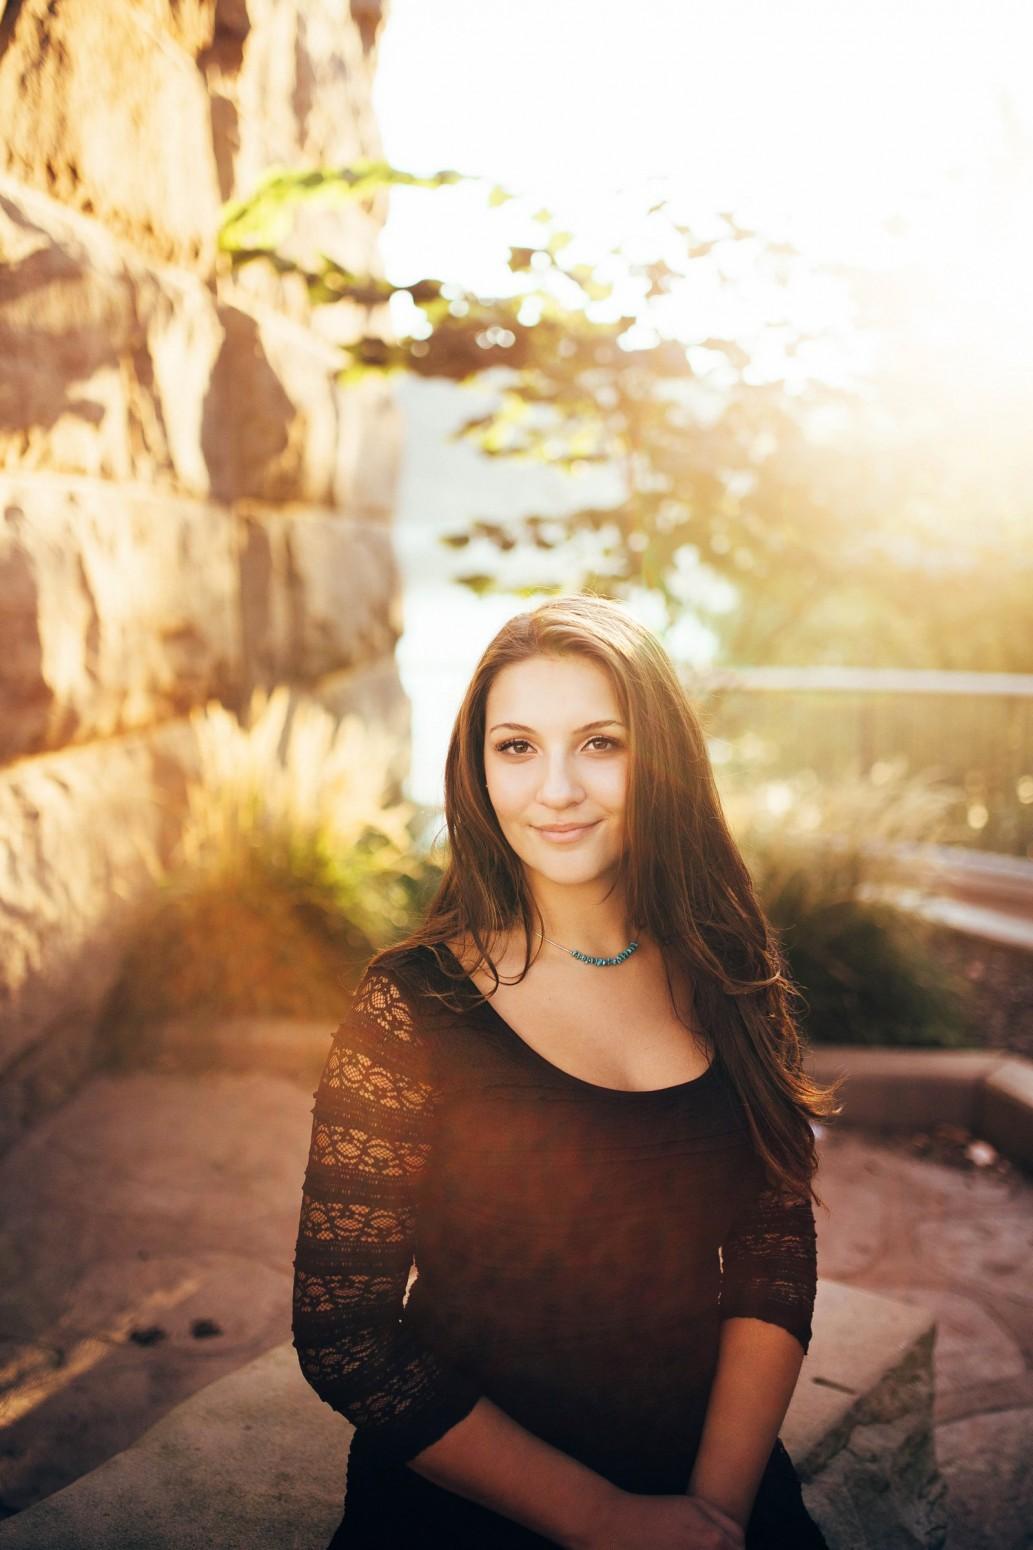 wild-native-photography-senior-portrait-photographer-pittsburgh-nadia_0170